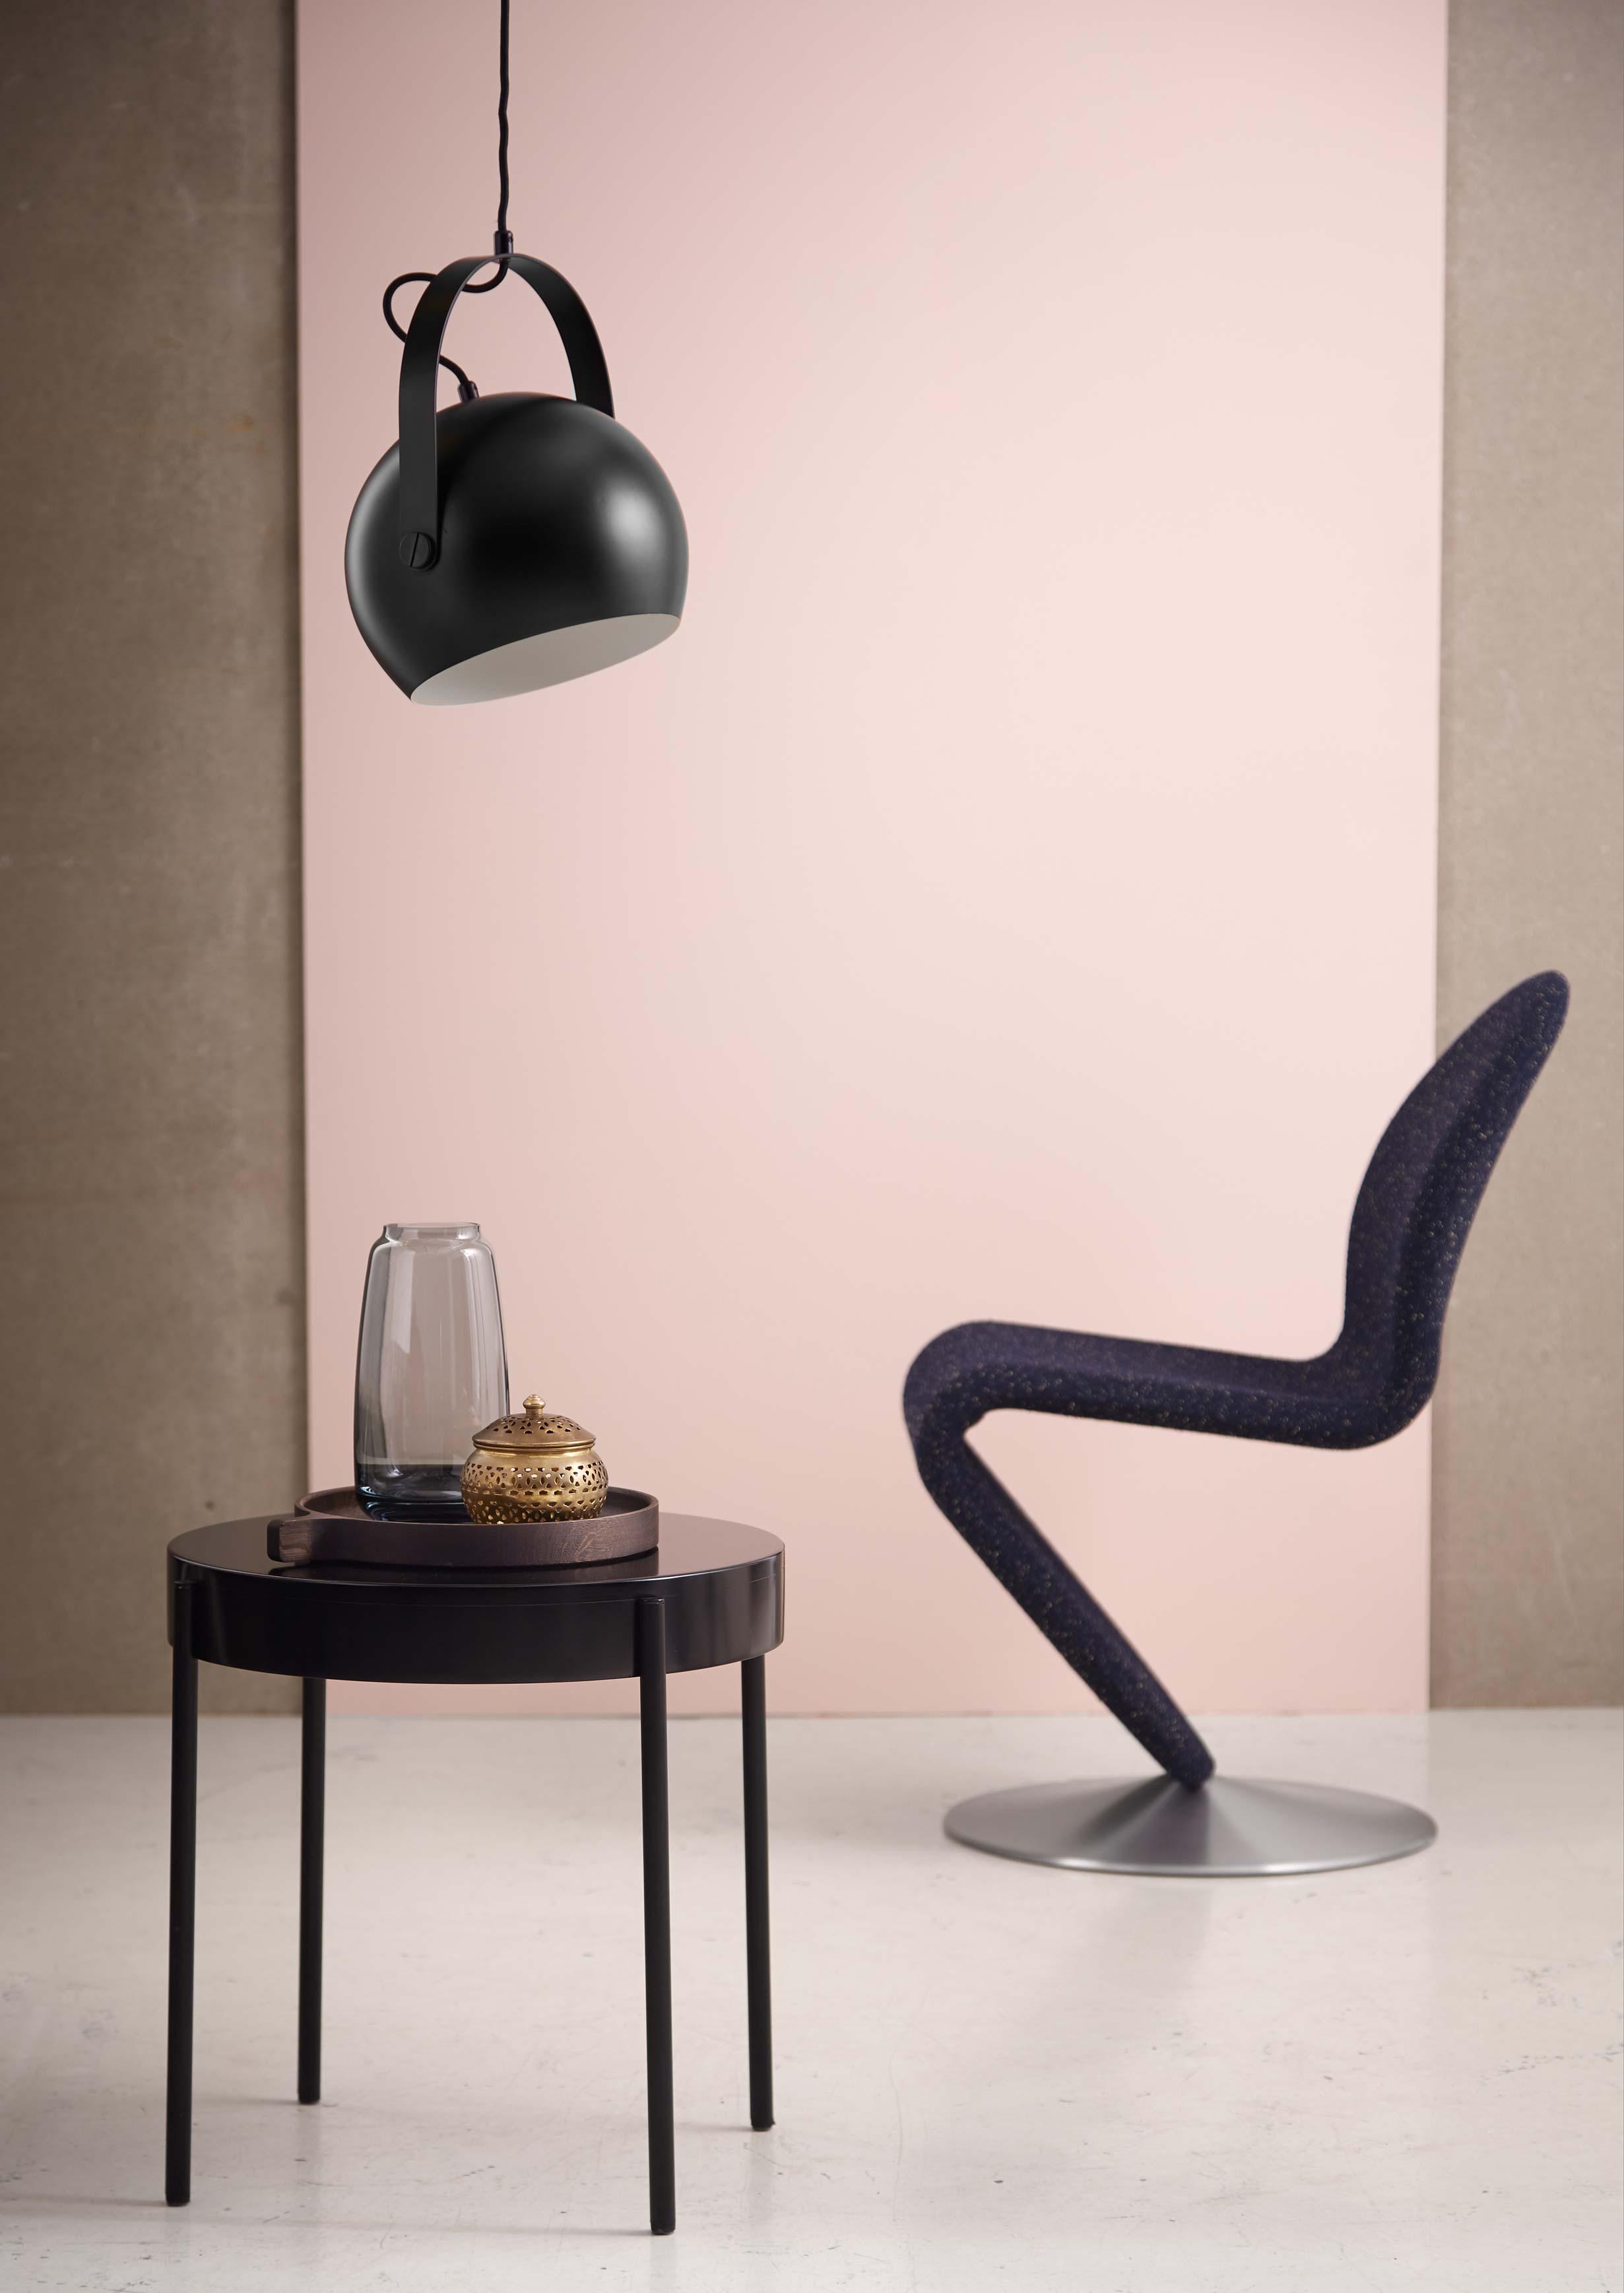 Ball-pendant-with-handle-black-matt---lifestyle-Studio-Horsens.jpg